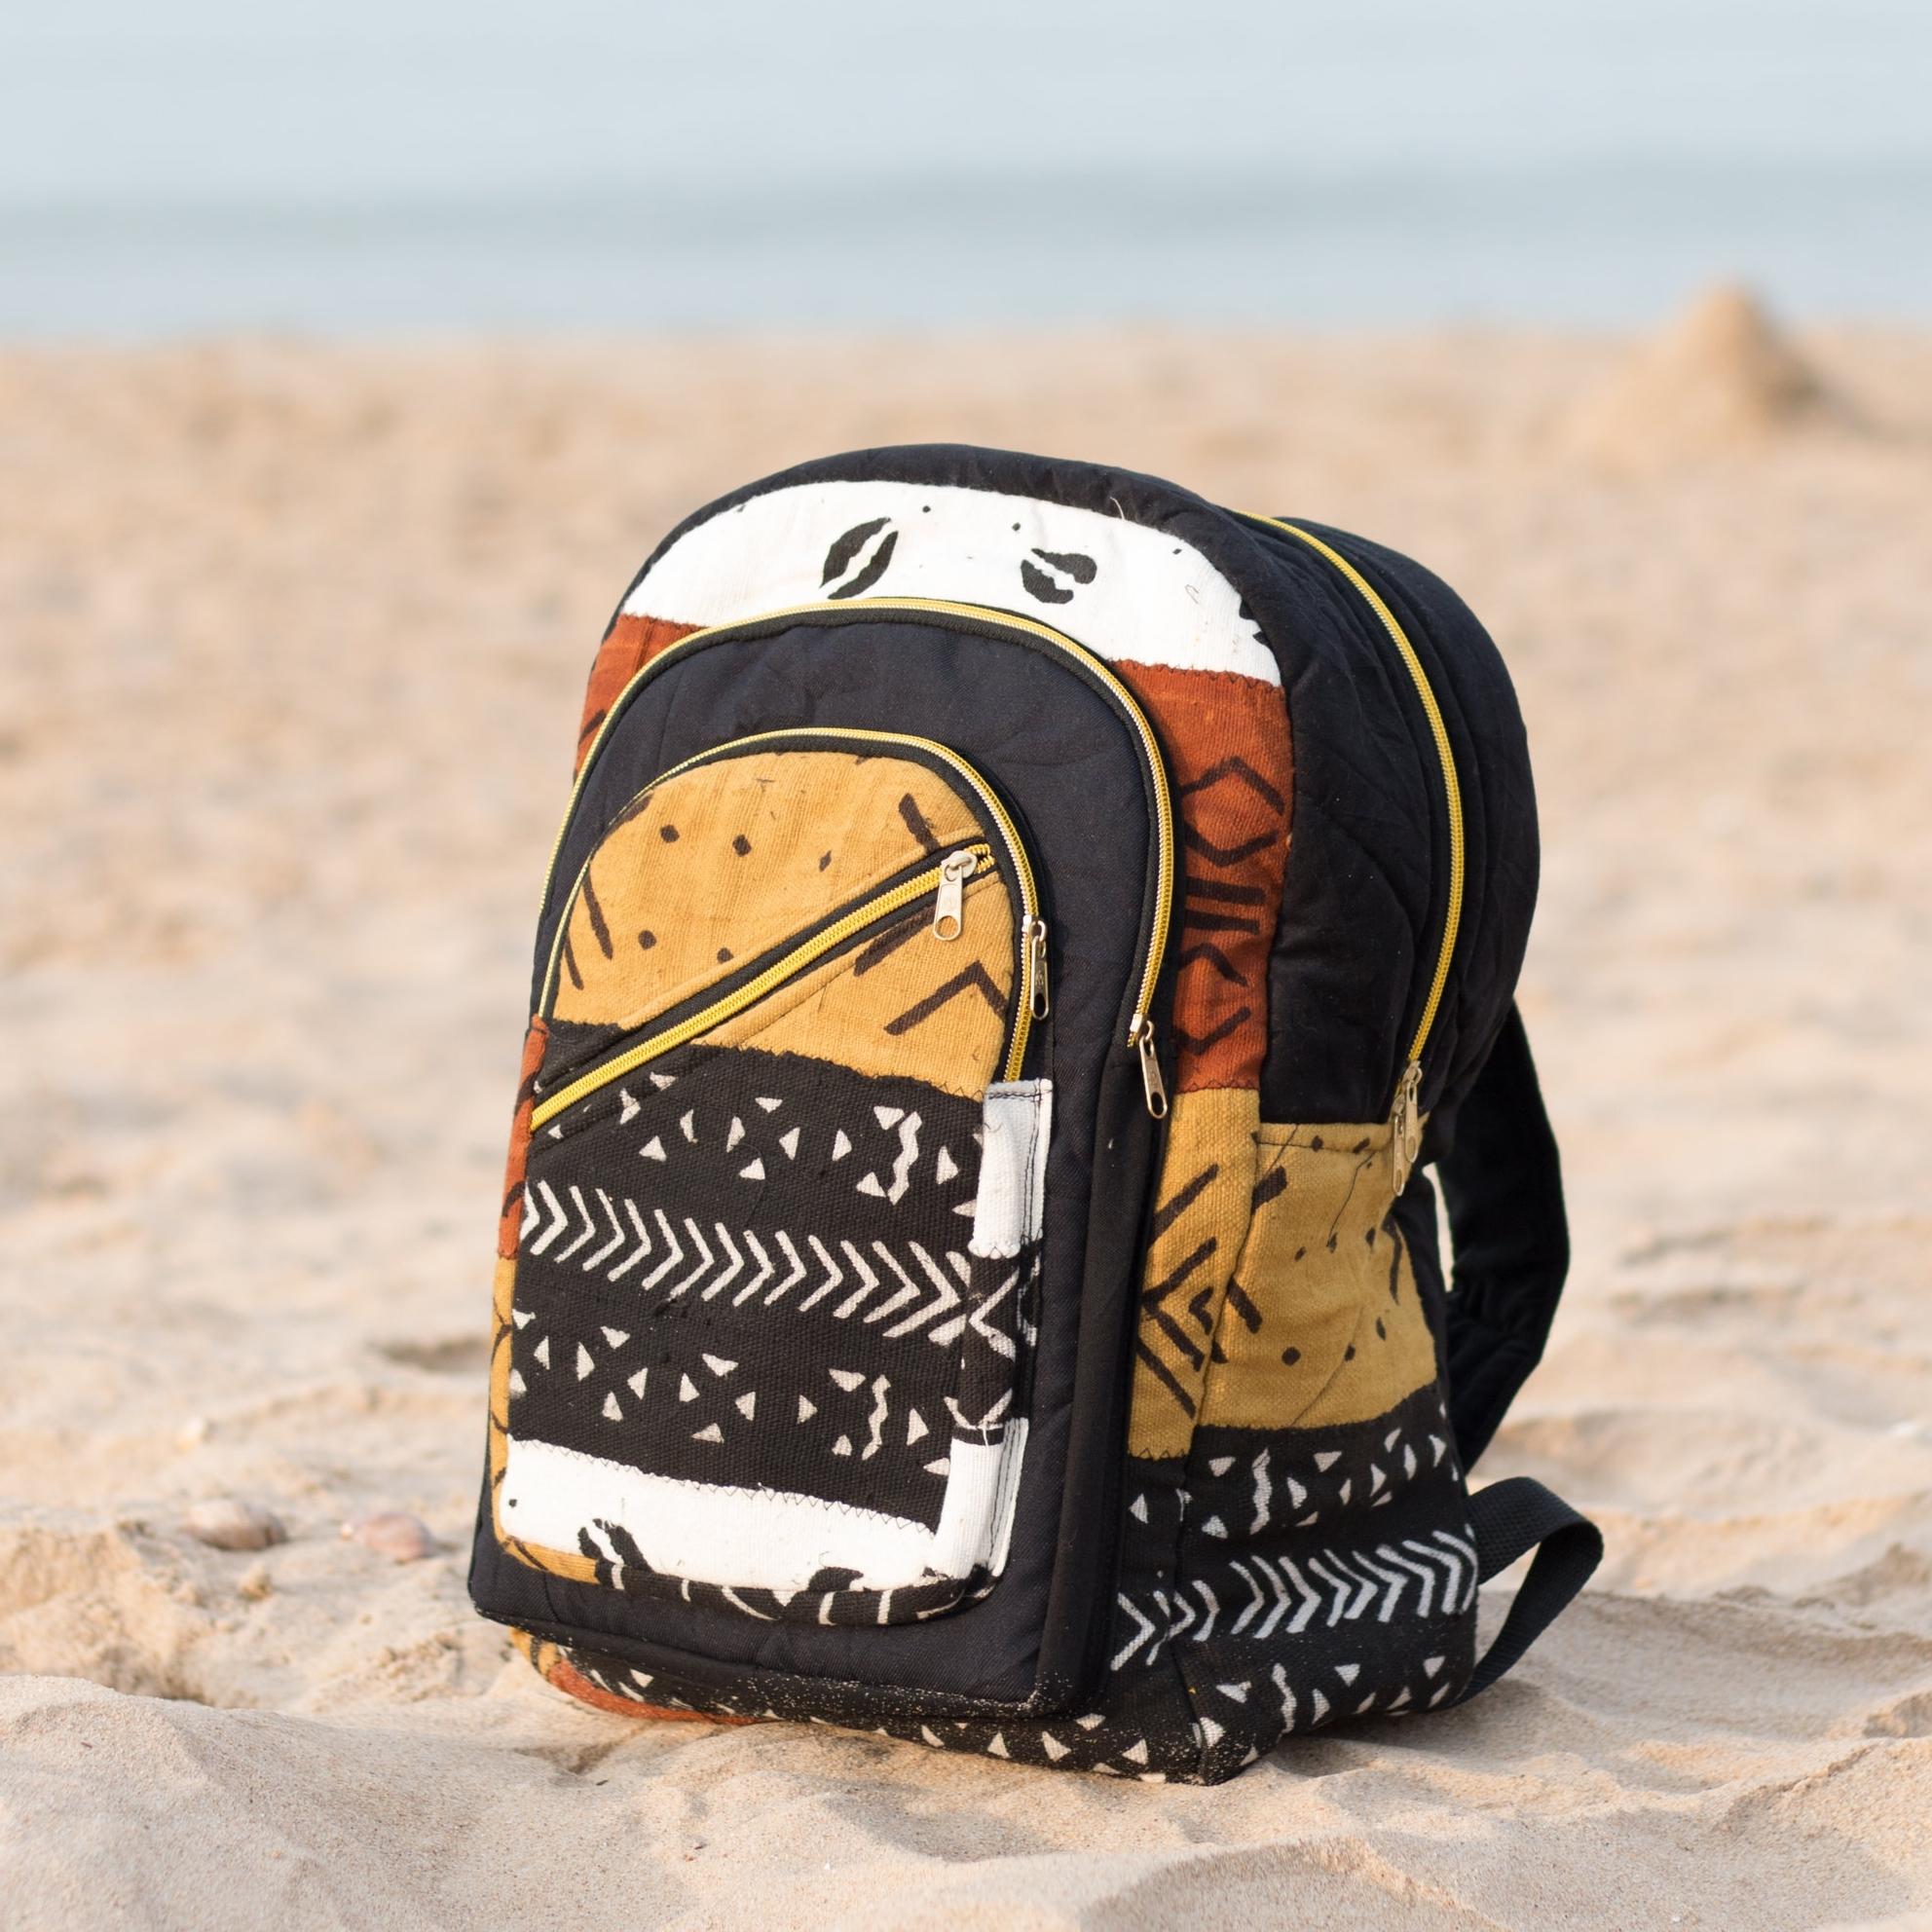 Mud cloth backpack from Kobina